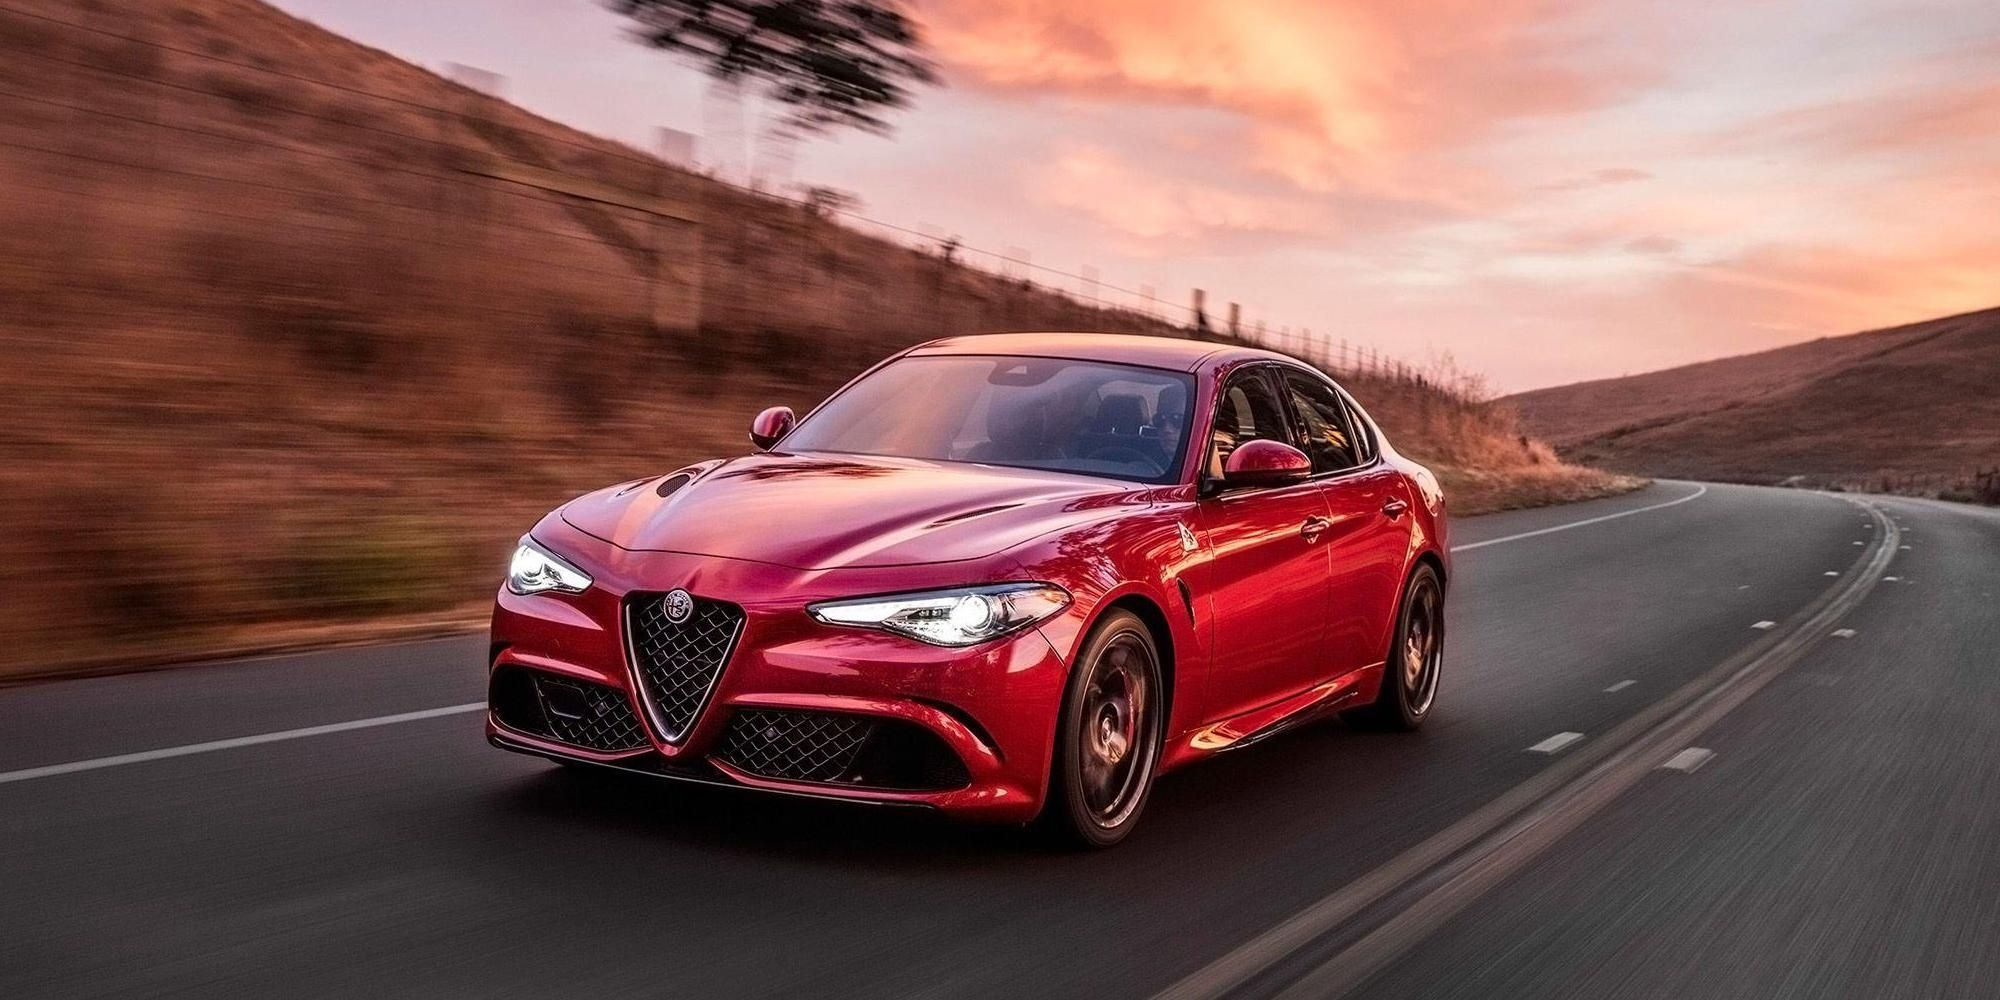 2021 Alfa Romeo Giulia Quadrifoglio: Costs, Facts, And Figures